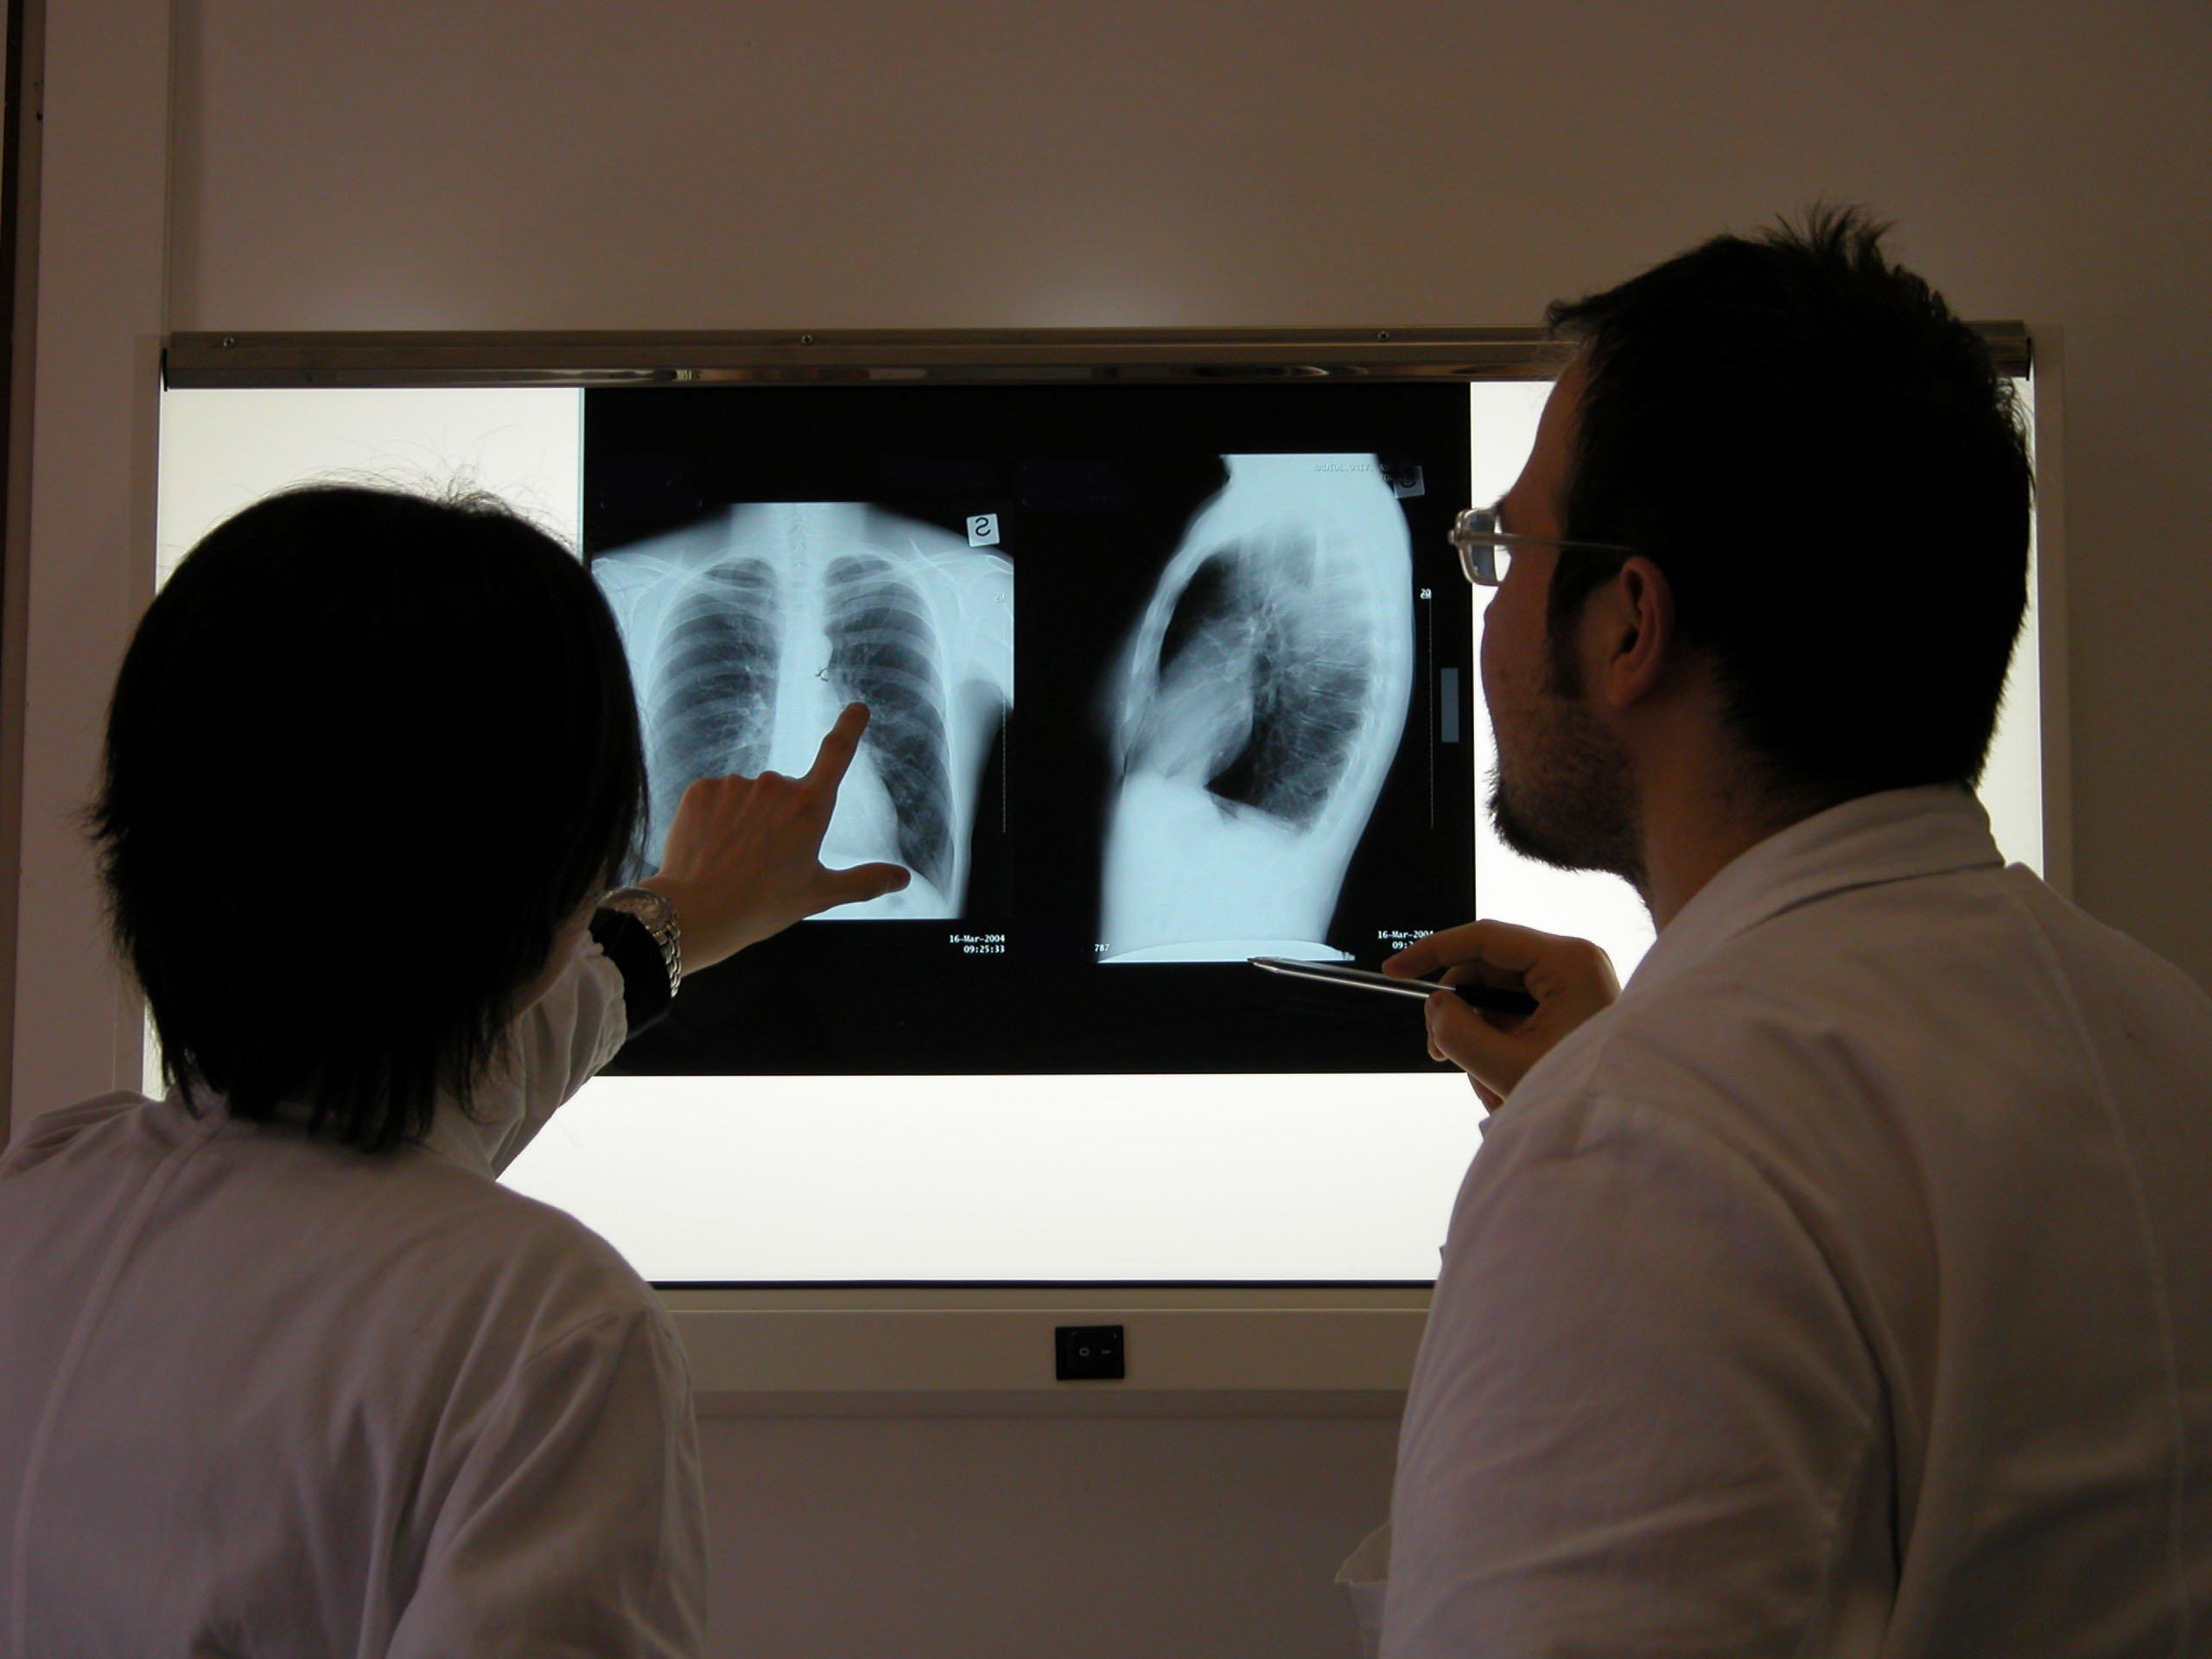 Минздрав опубликовал статистику по заболеваемости пневмонией